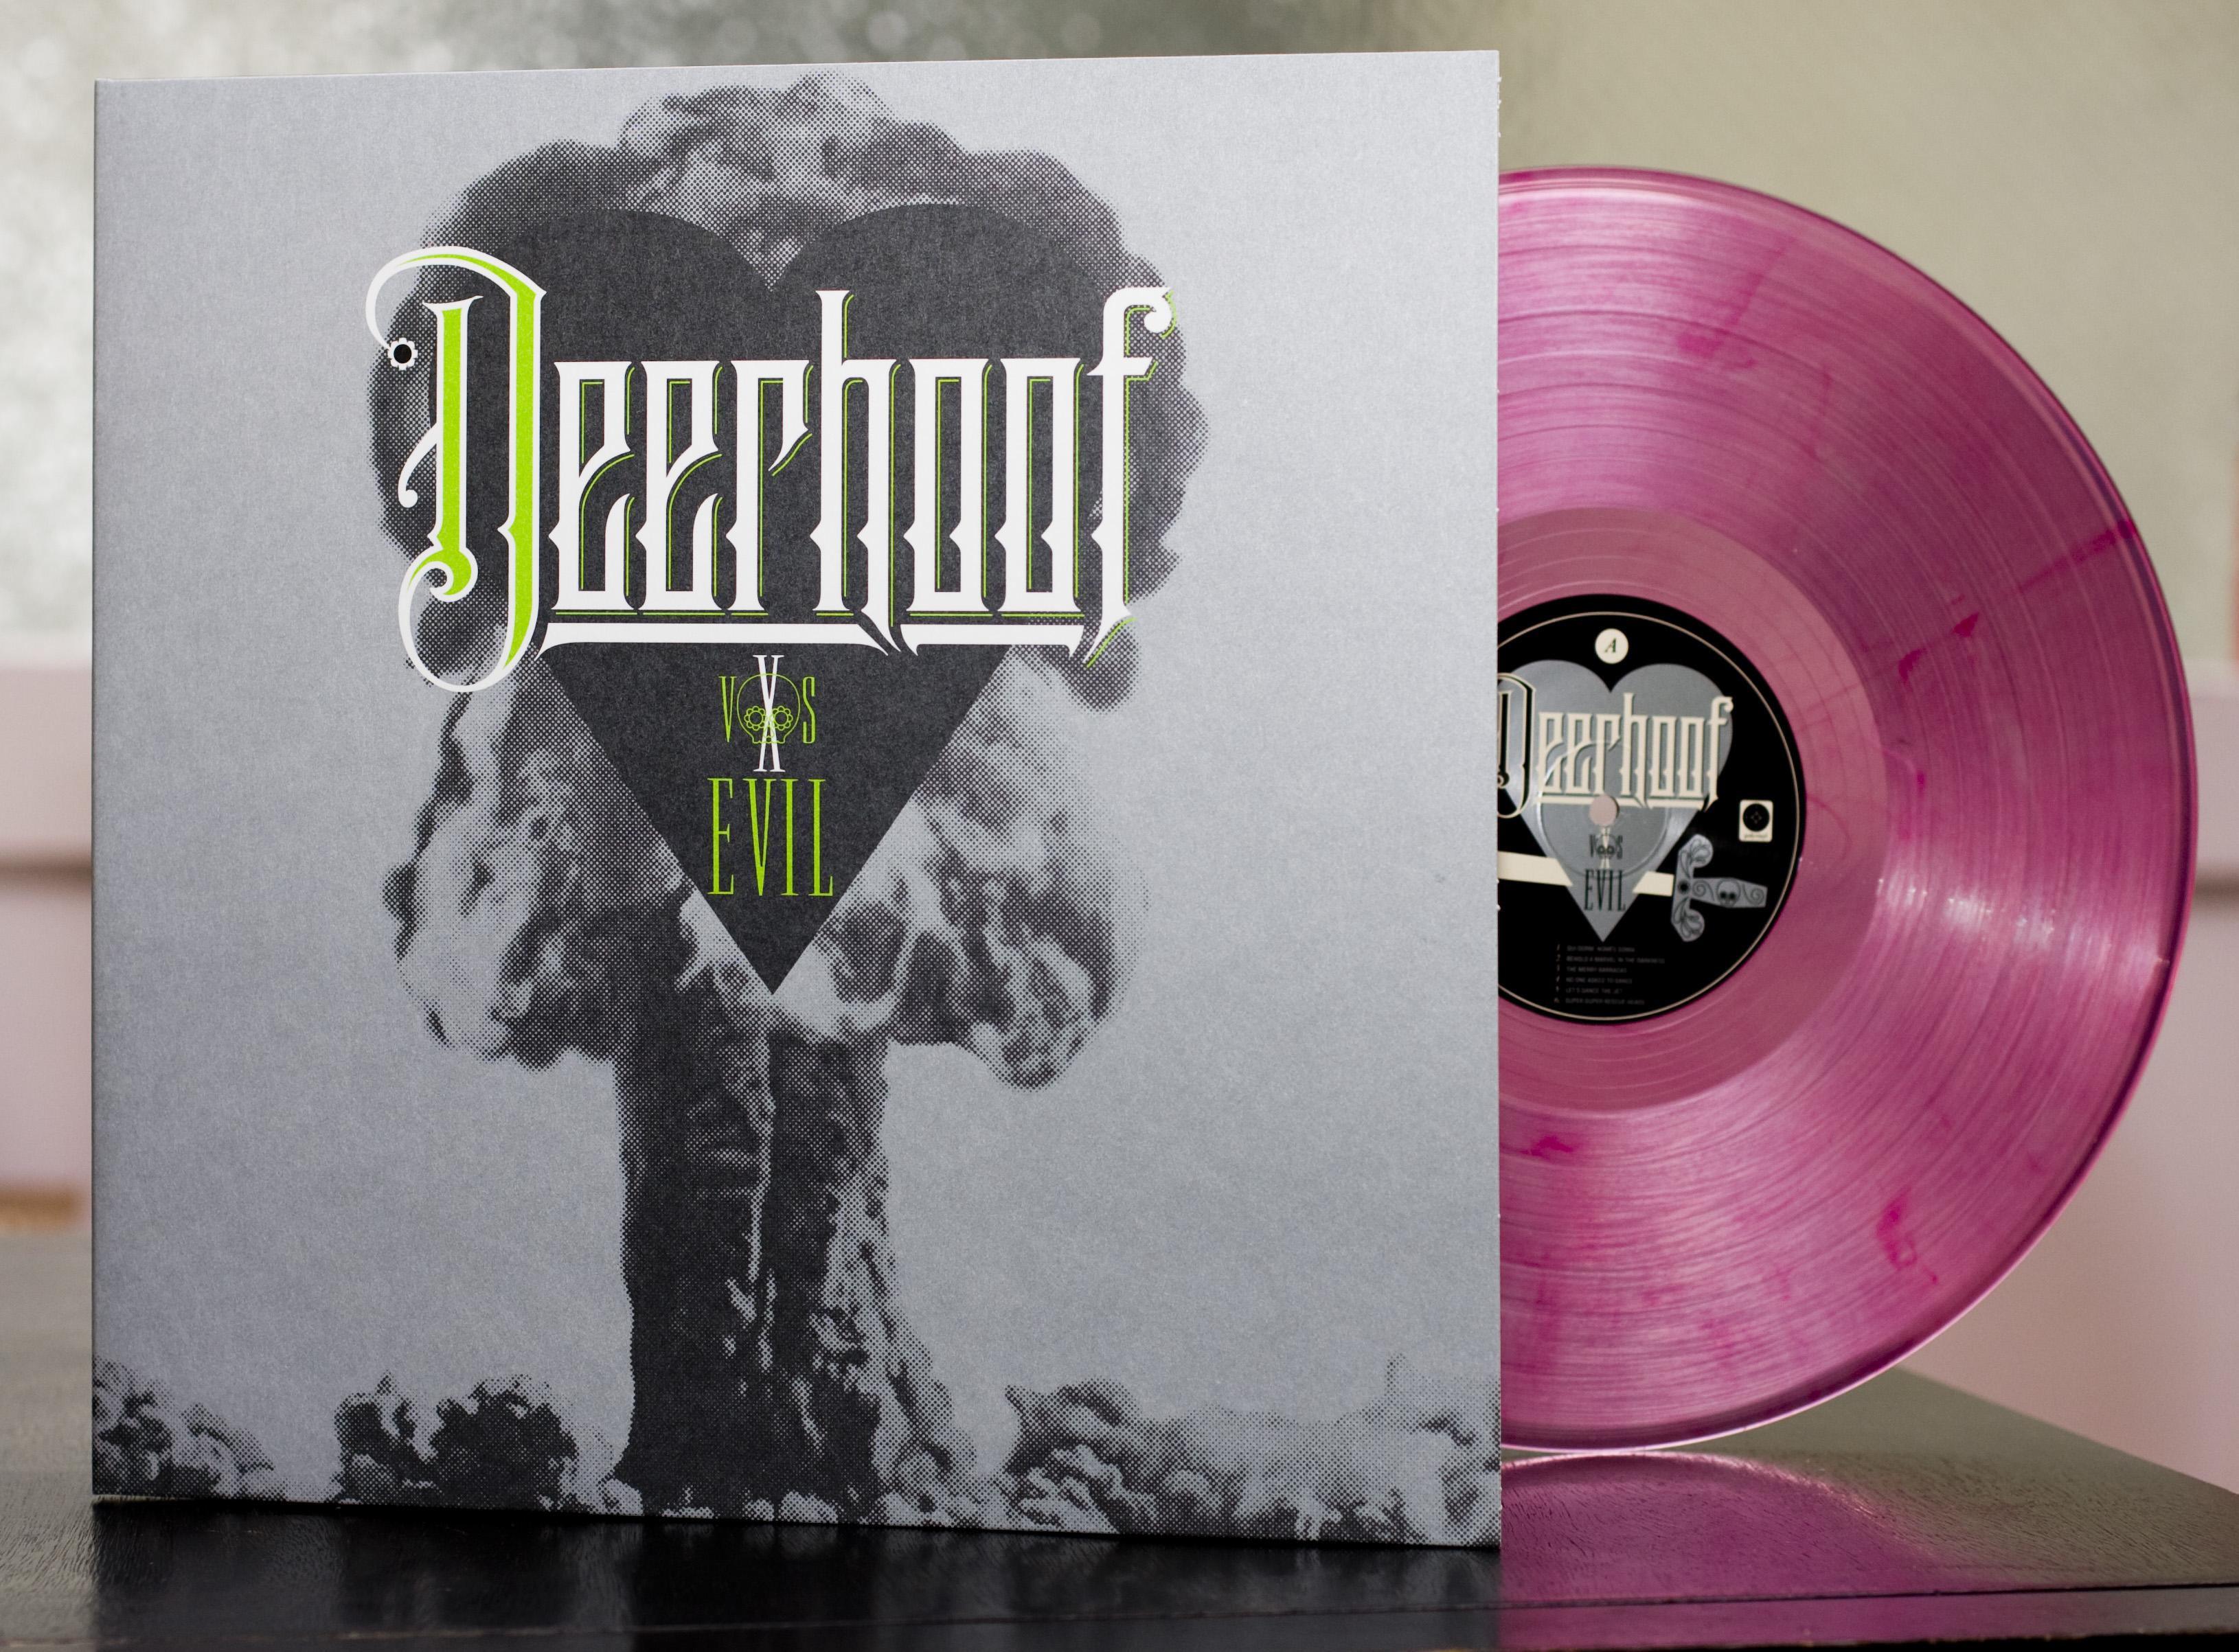 vinyl record creative Deerhoof vs. Evil